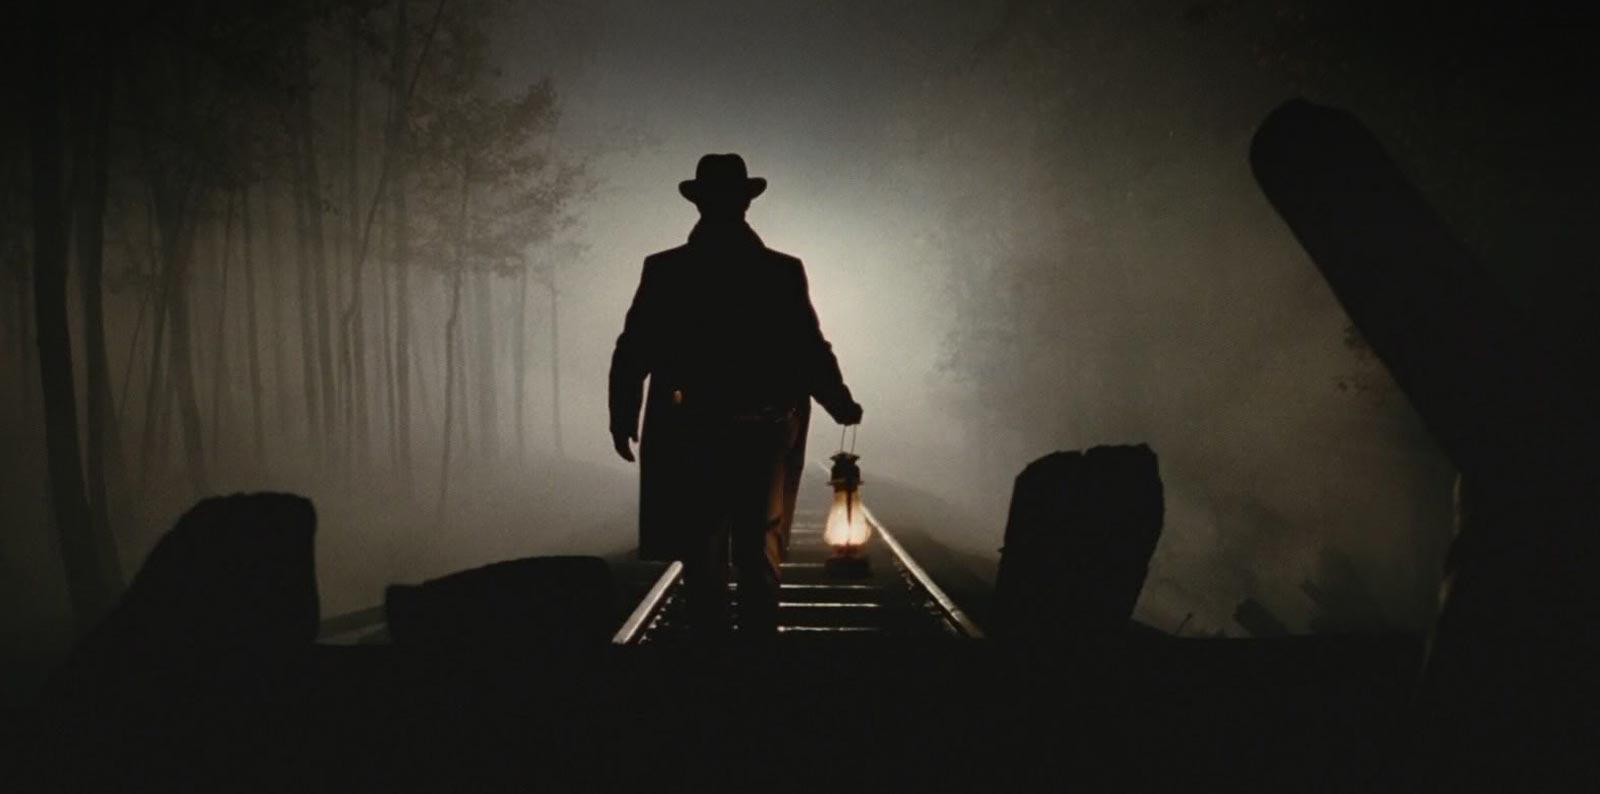 Roger Deakins' Iconic Career in 20 Legendary Shots